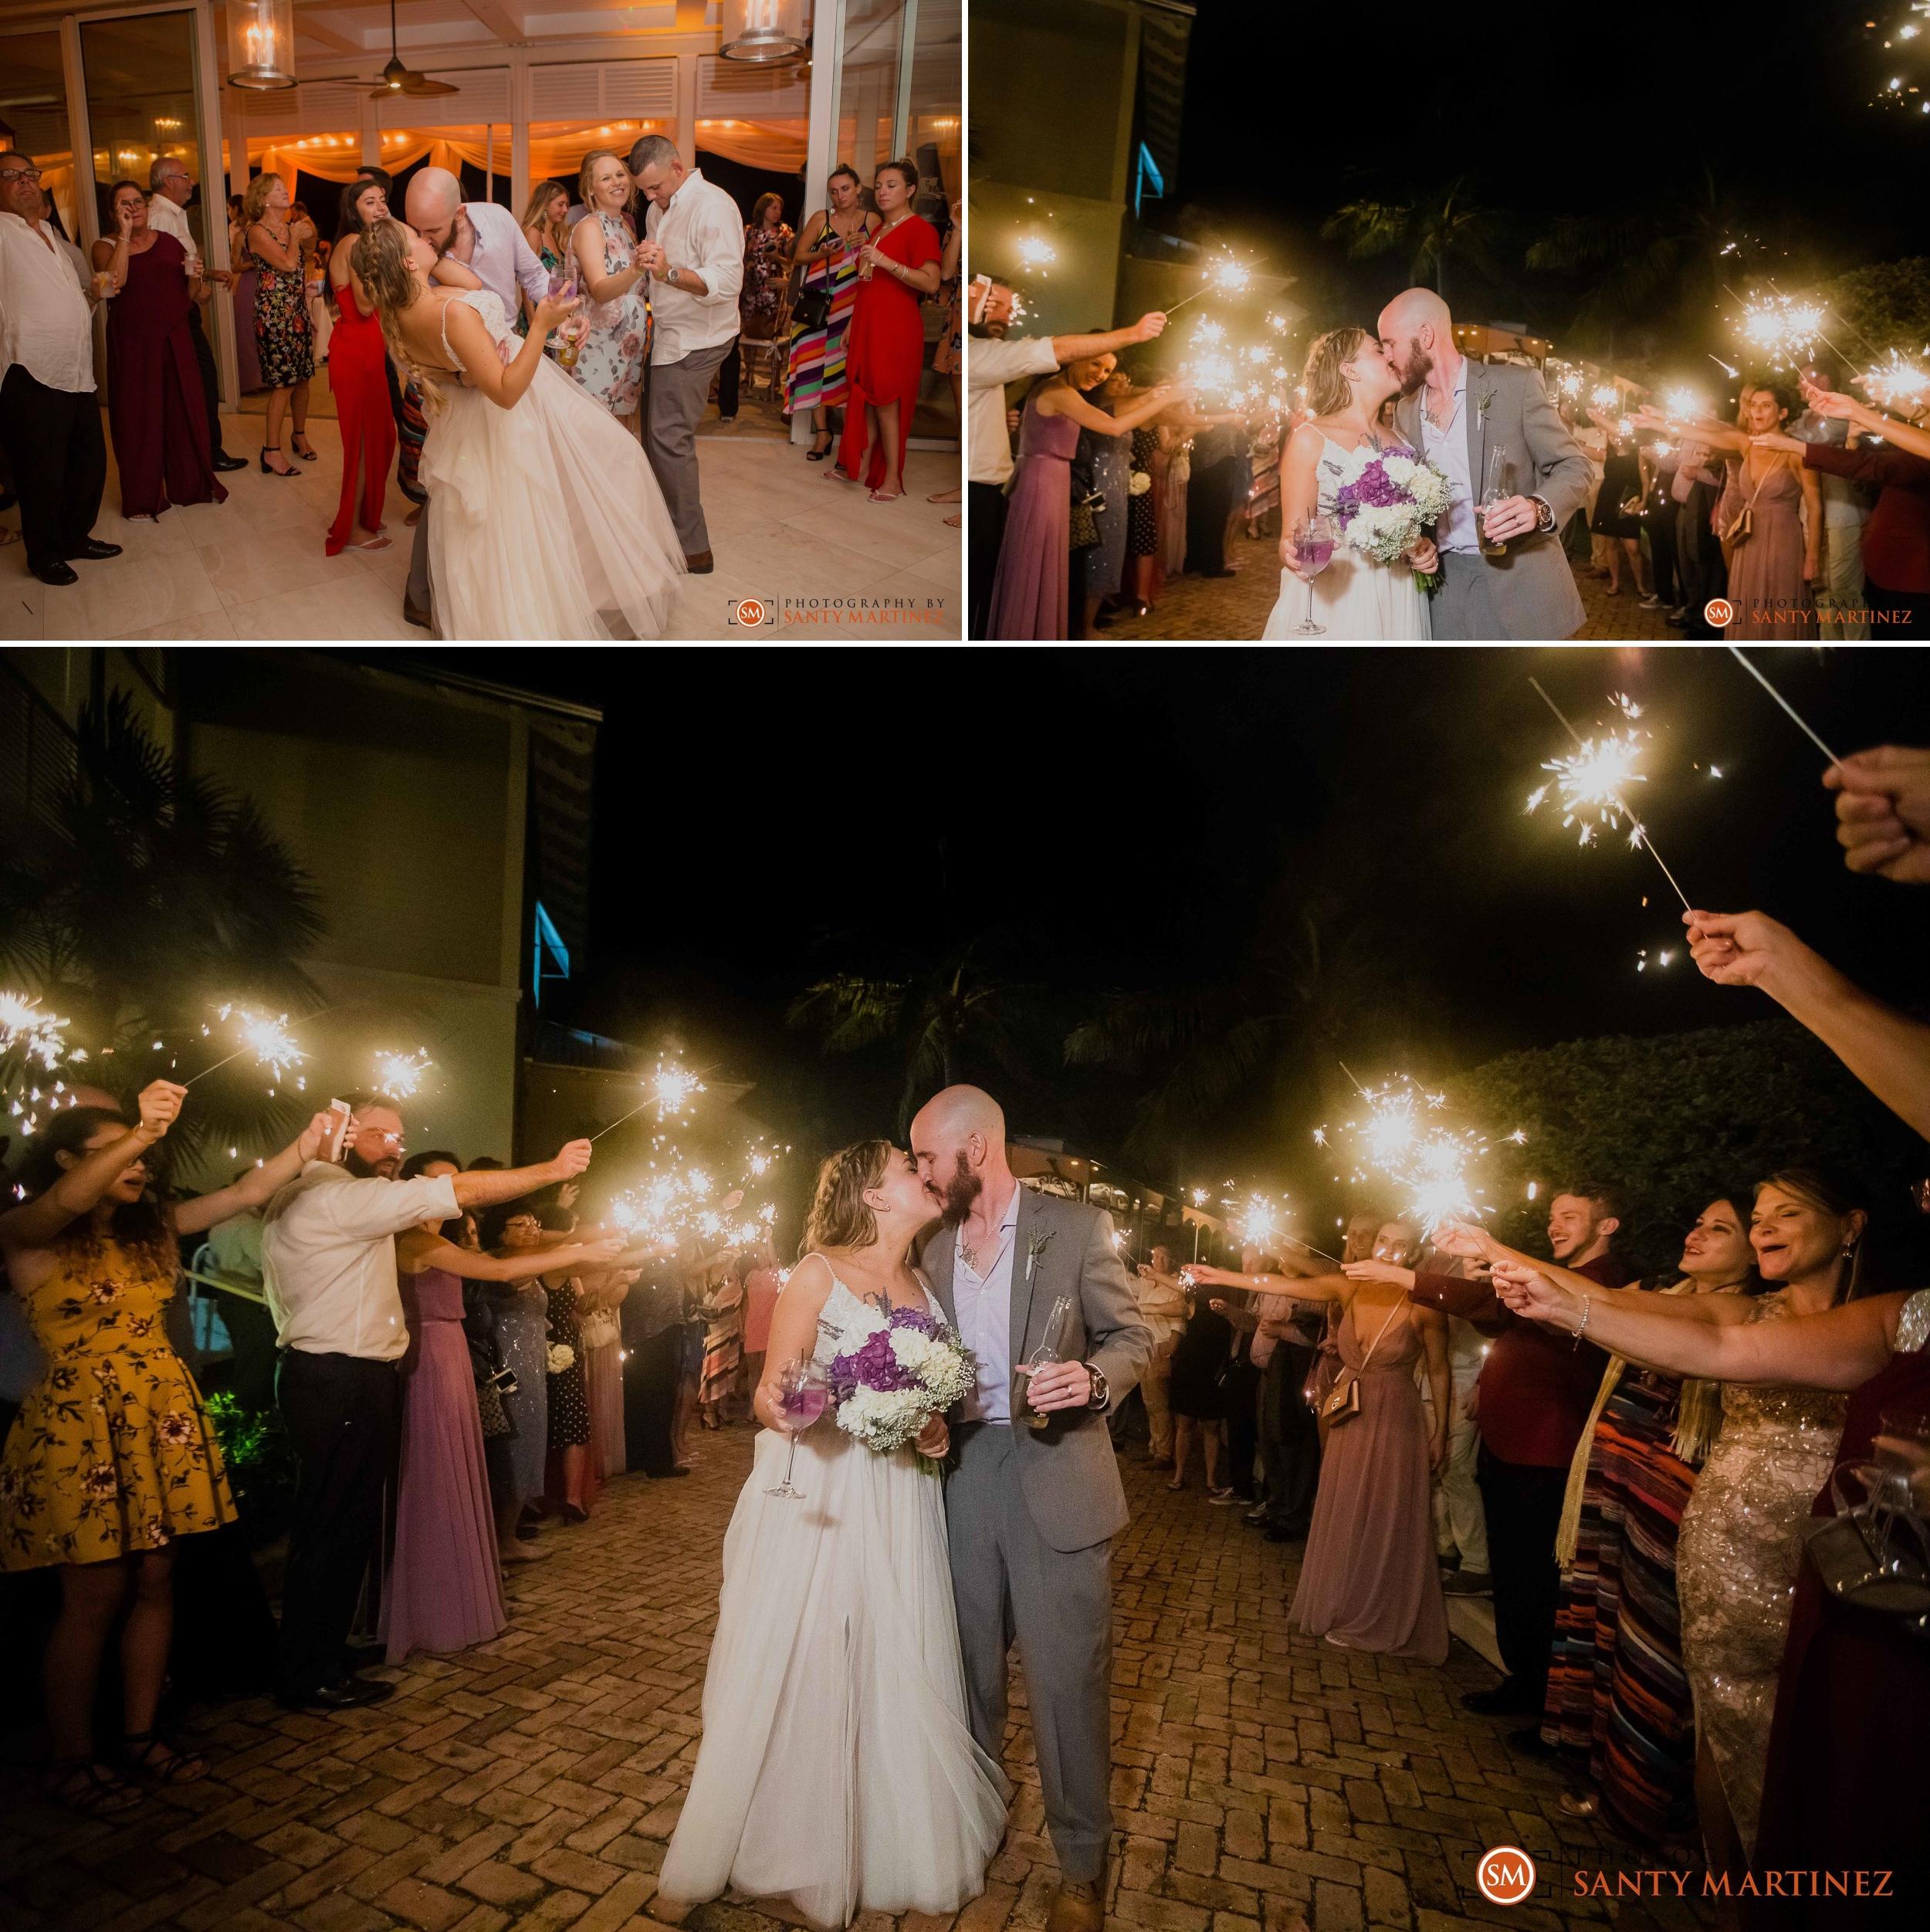 Wedding - Seagate Beach Club - Hotel - Delray Beach - Santy Martinez Photography 18.jpg